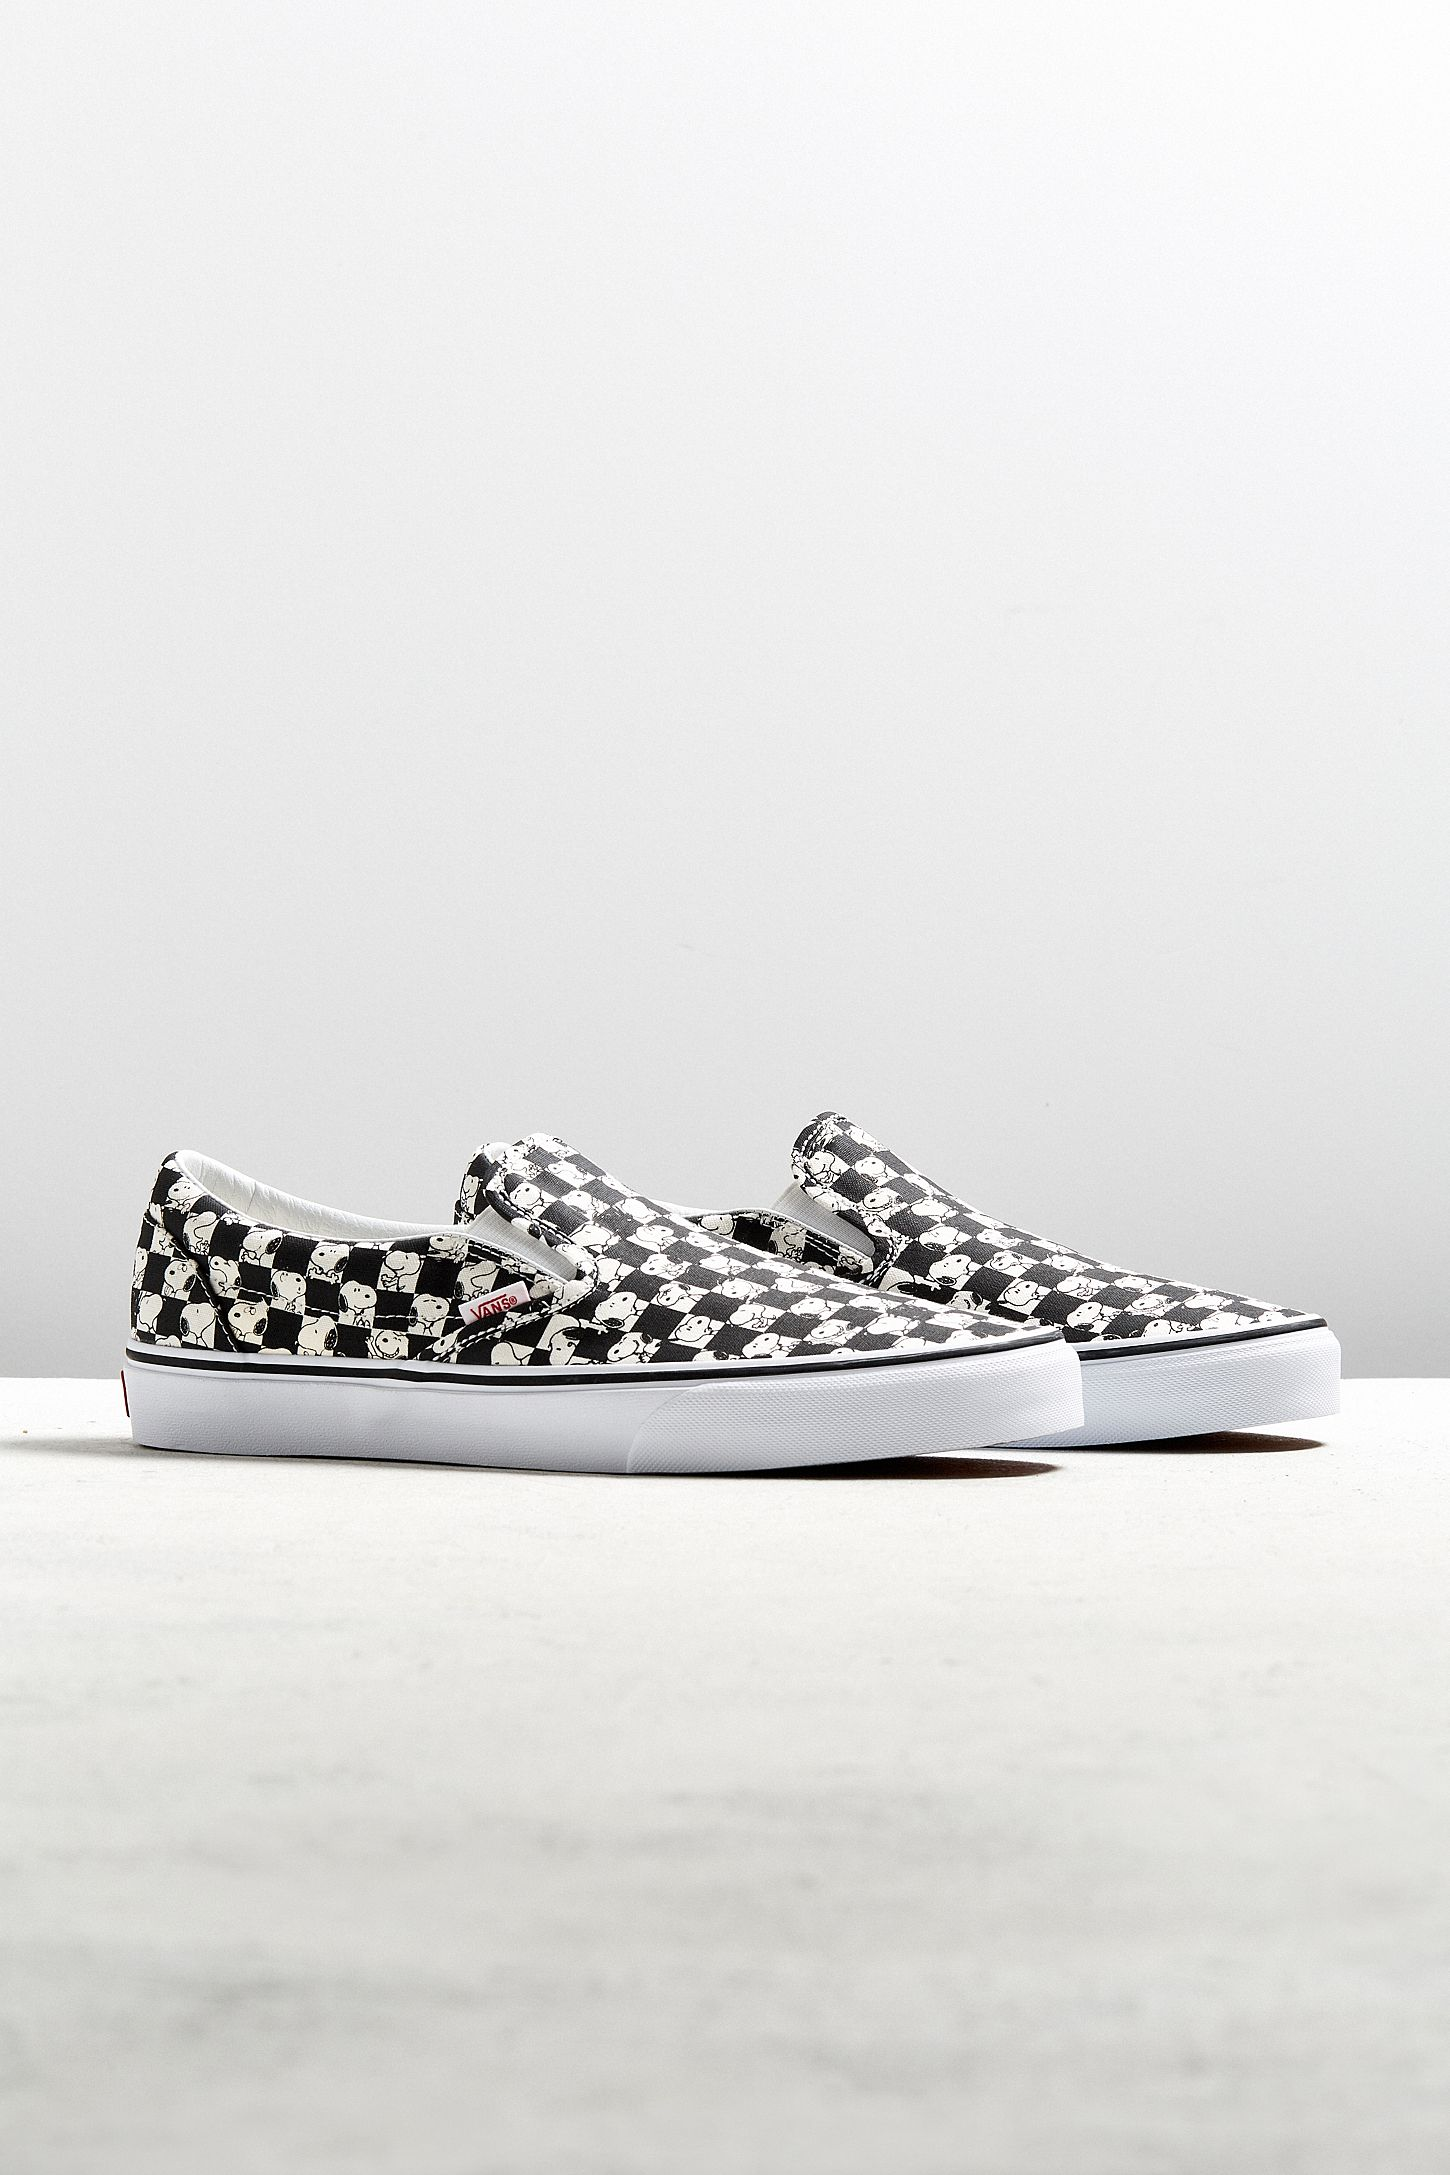 bcccda15a8e Vans X Peanuts Classic Slip-On Snoopy Checkerboard Sneaker